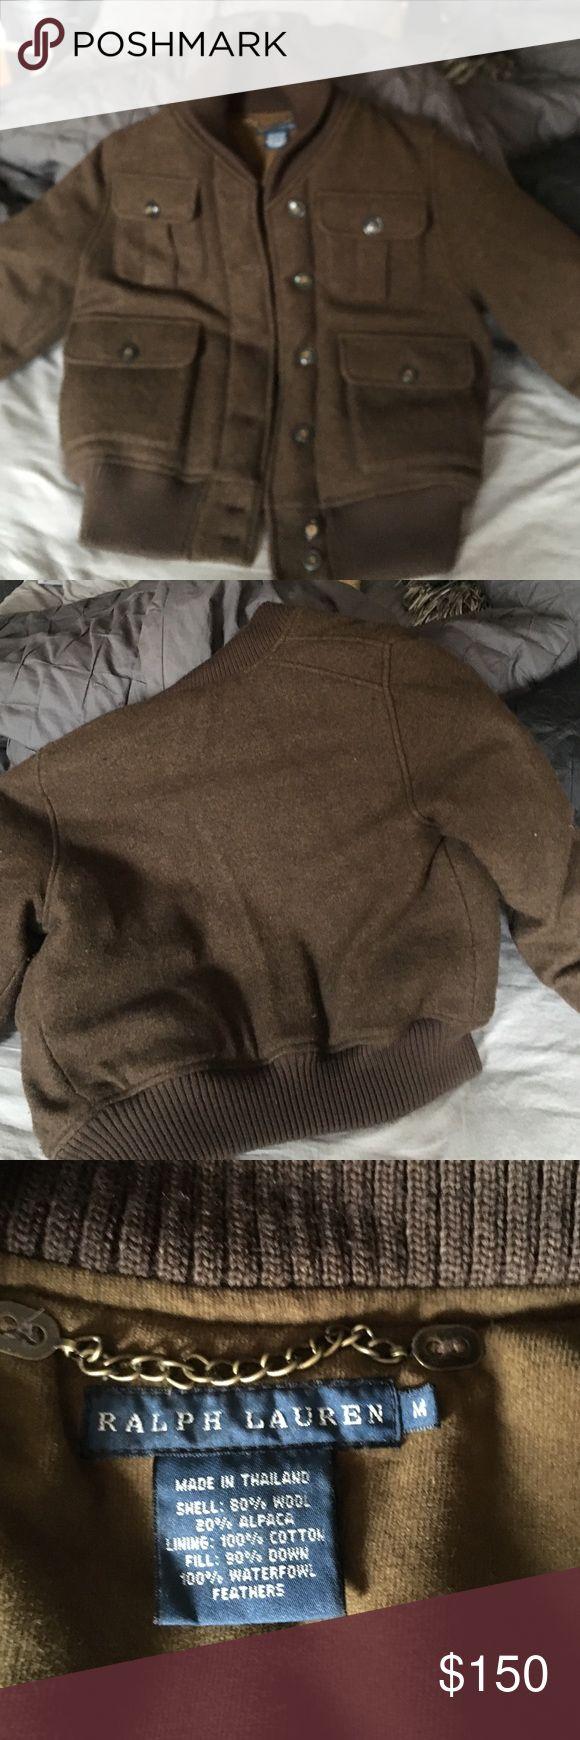 Brown Wool Bomber Jacket 4 Front button pockets 6 Front button closure wool collar Ralph Lauren Jackets & Coats